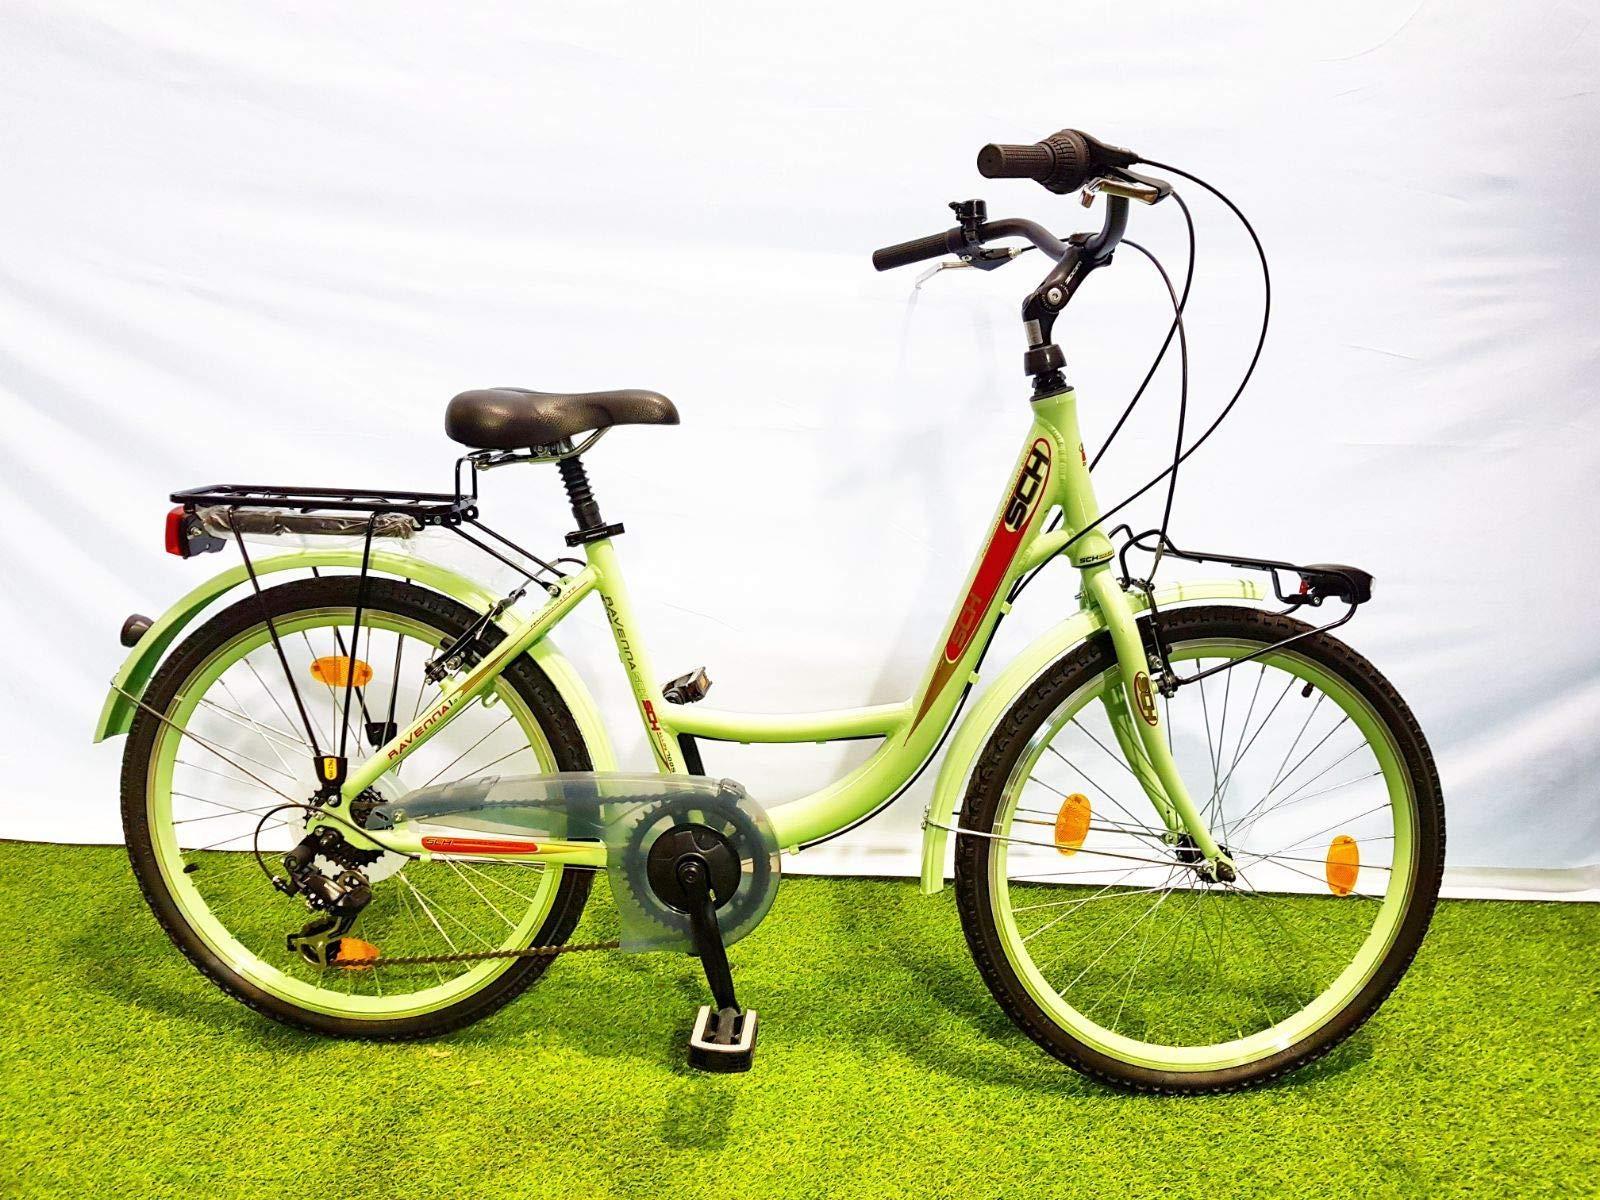 SCHIANO Bicicleta Holanda Mujer Ravenna 24